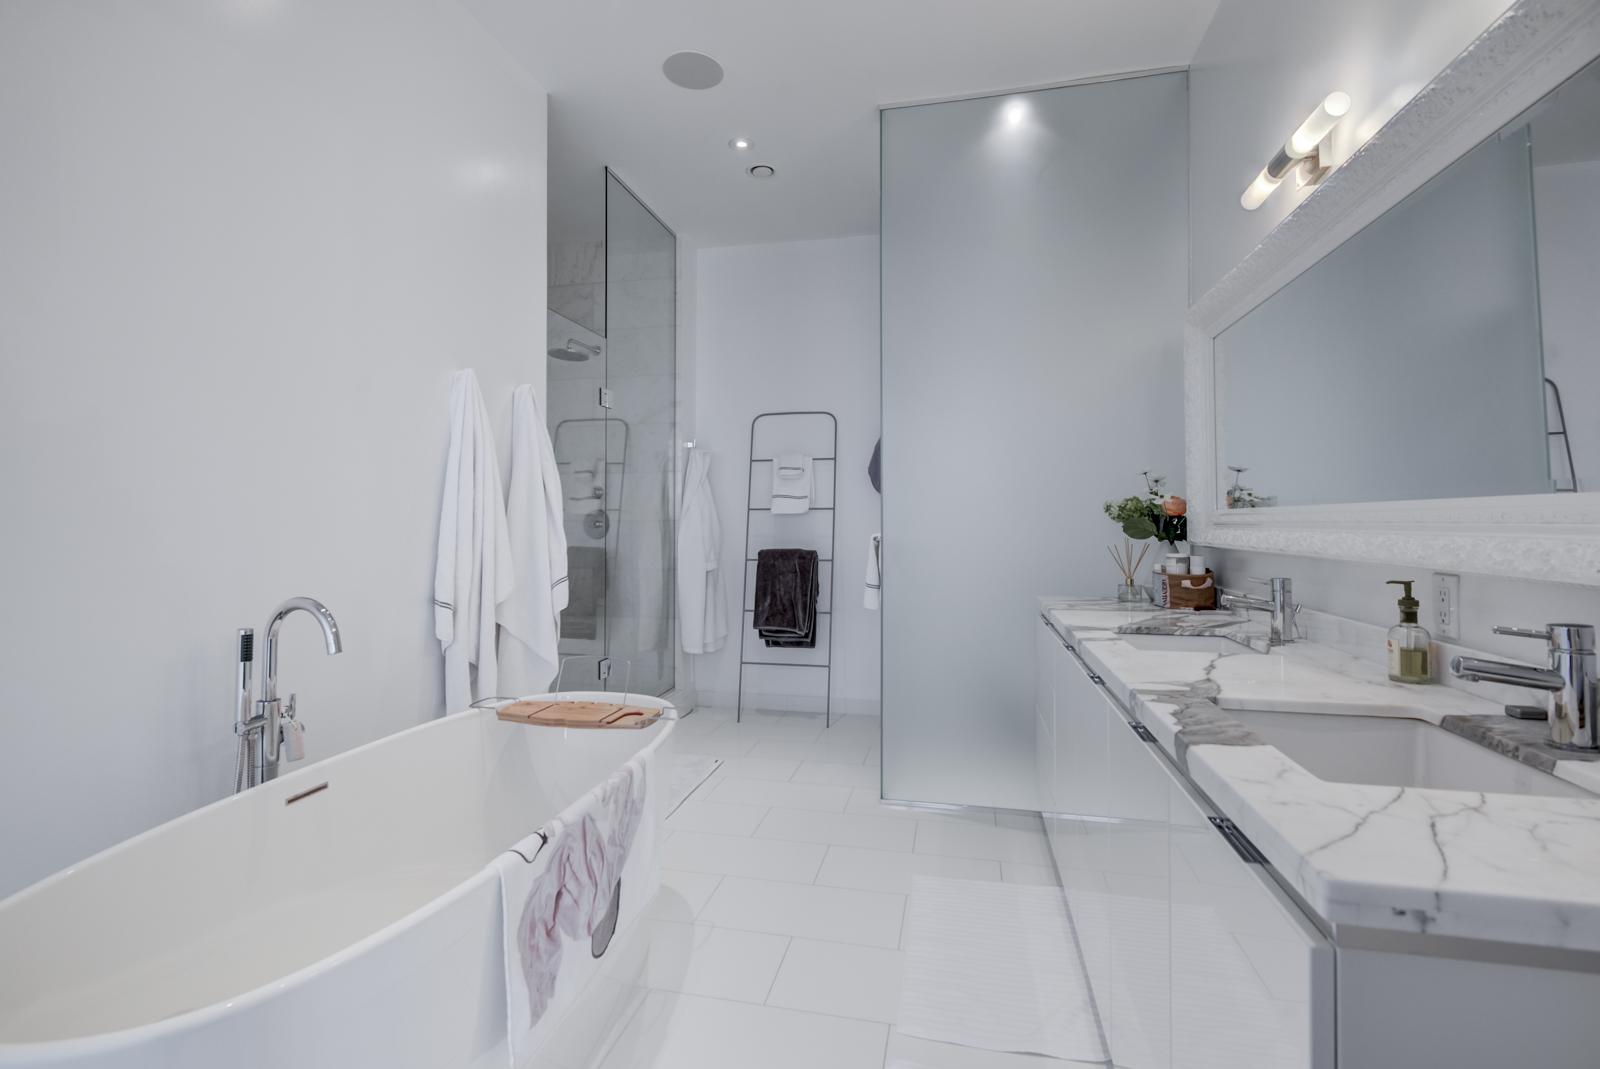 Casa Condo and its master bath.